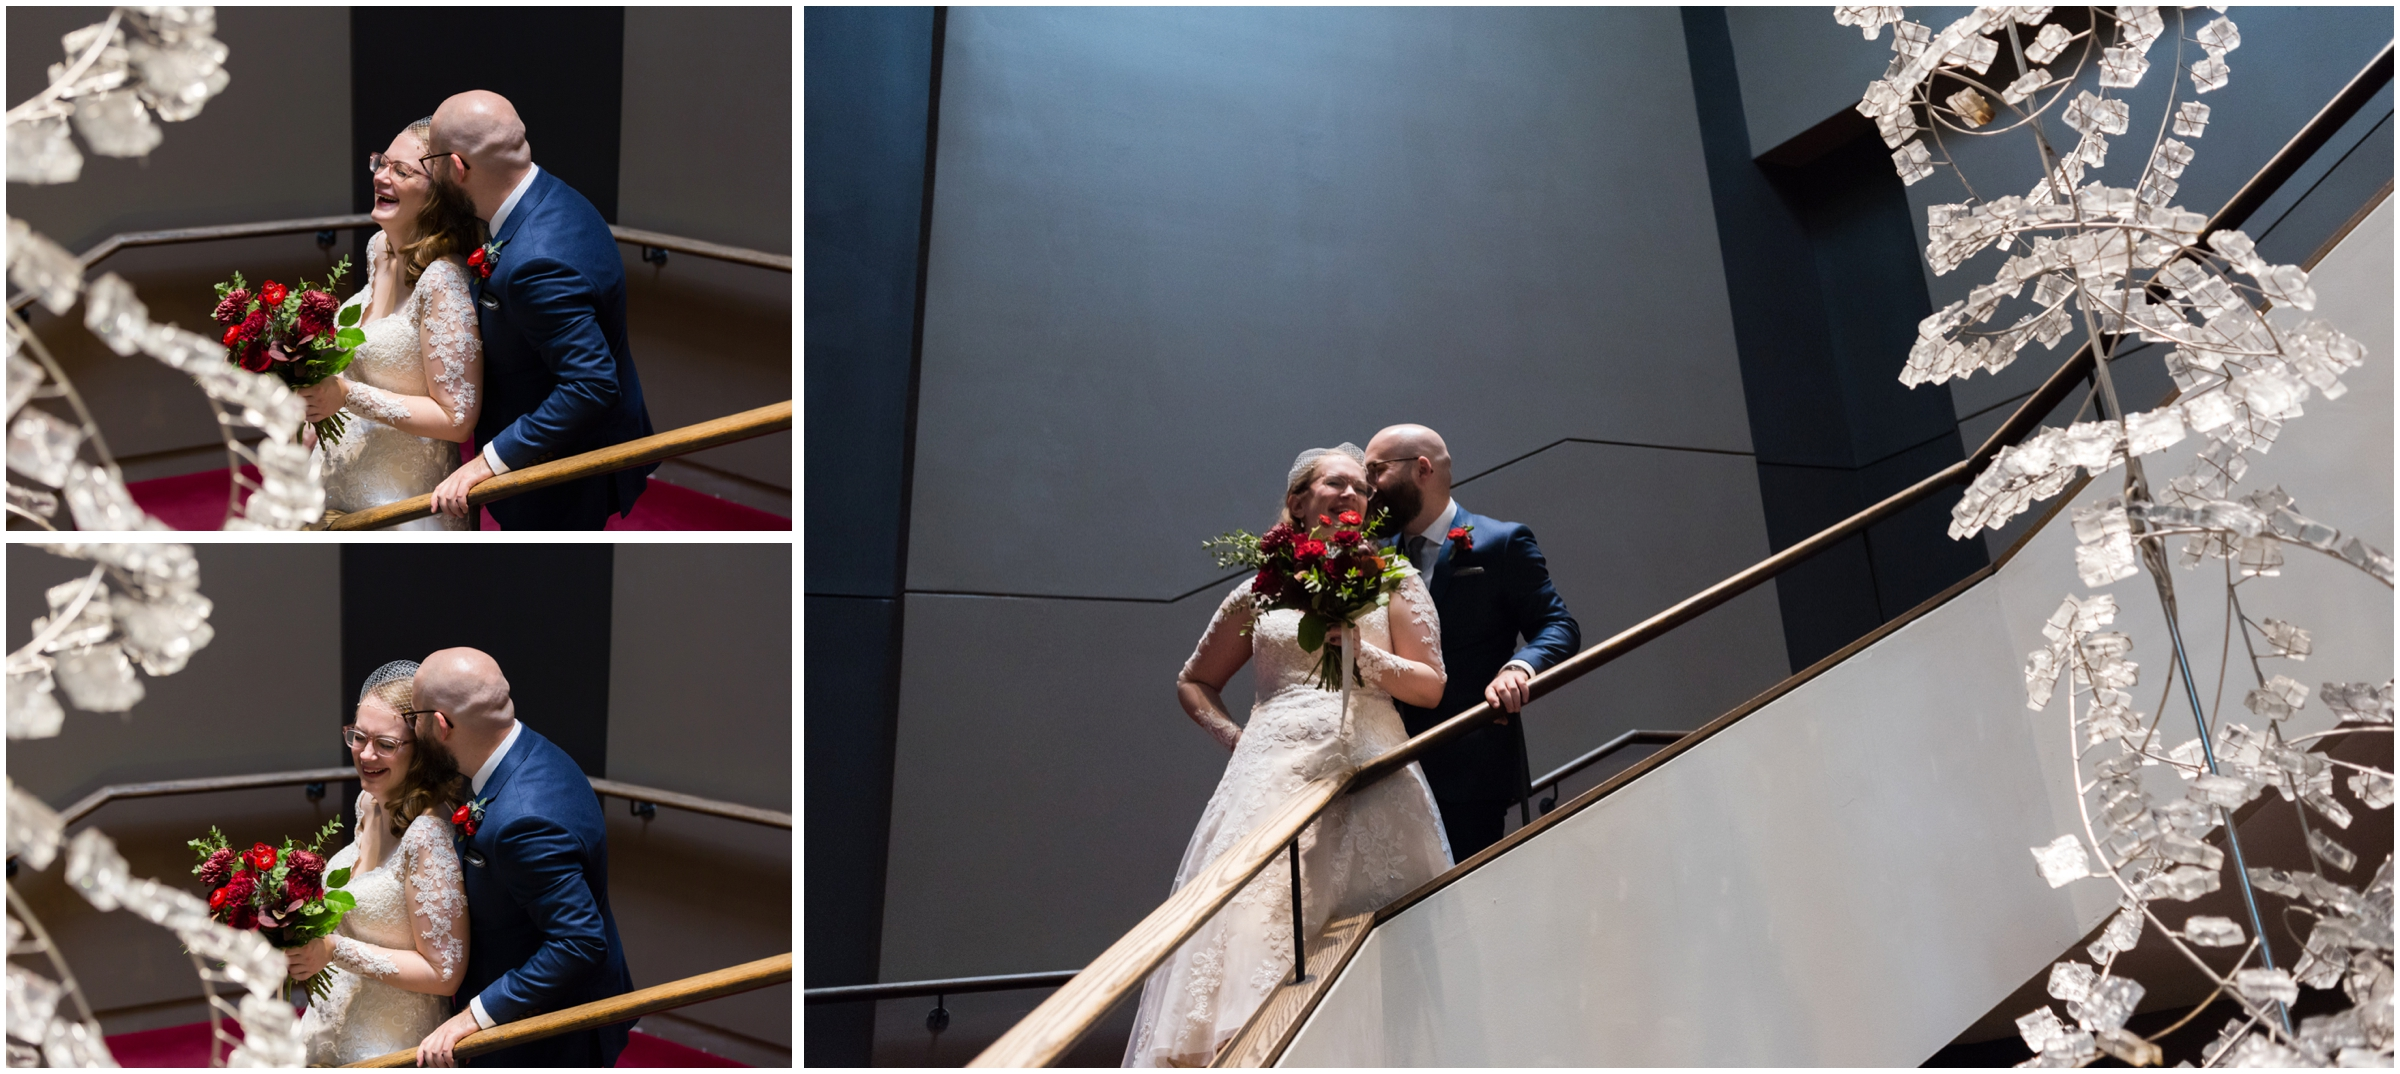 Ottaw Wedding Allison Andrew - (Selena Phillips-Boyle)_0039.jpg